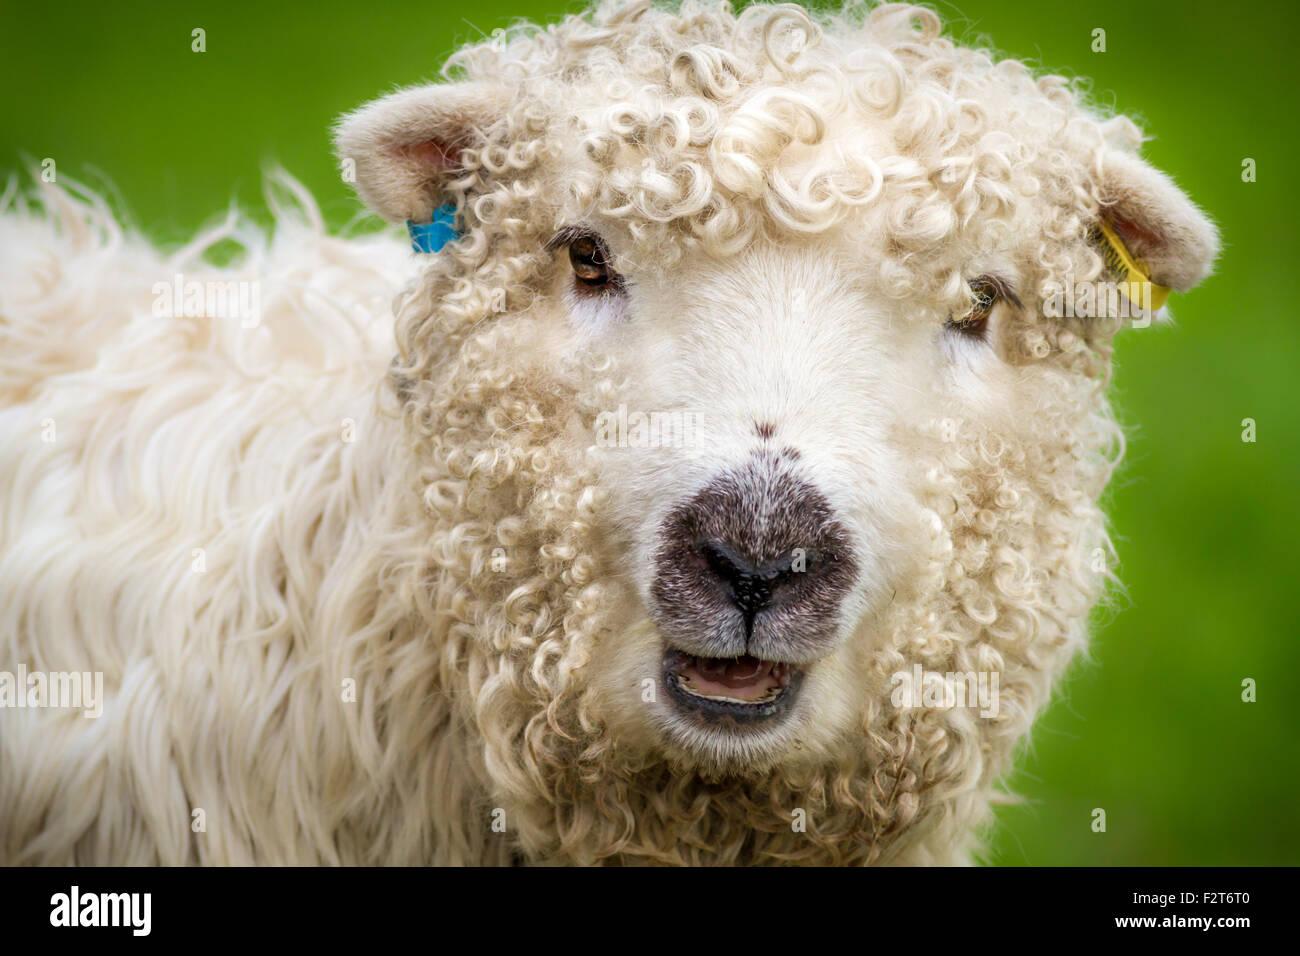 The pretty and rare breed, Greyface Dartmoor sheep (ewe), UK - Stock Image